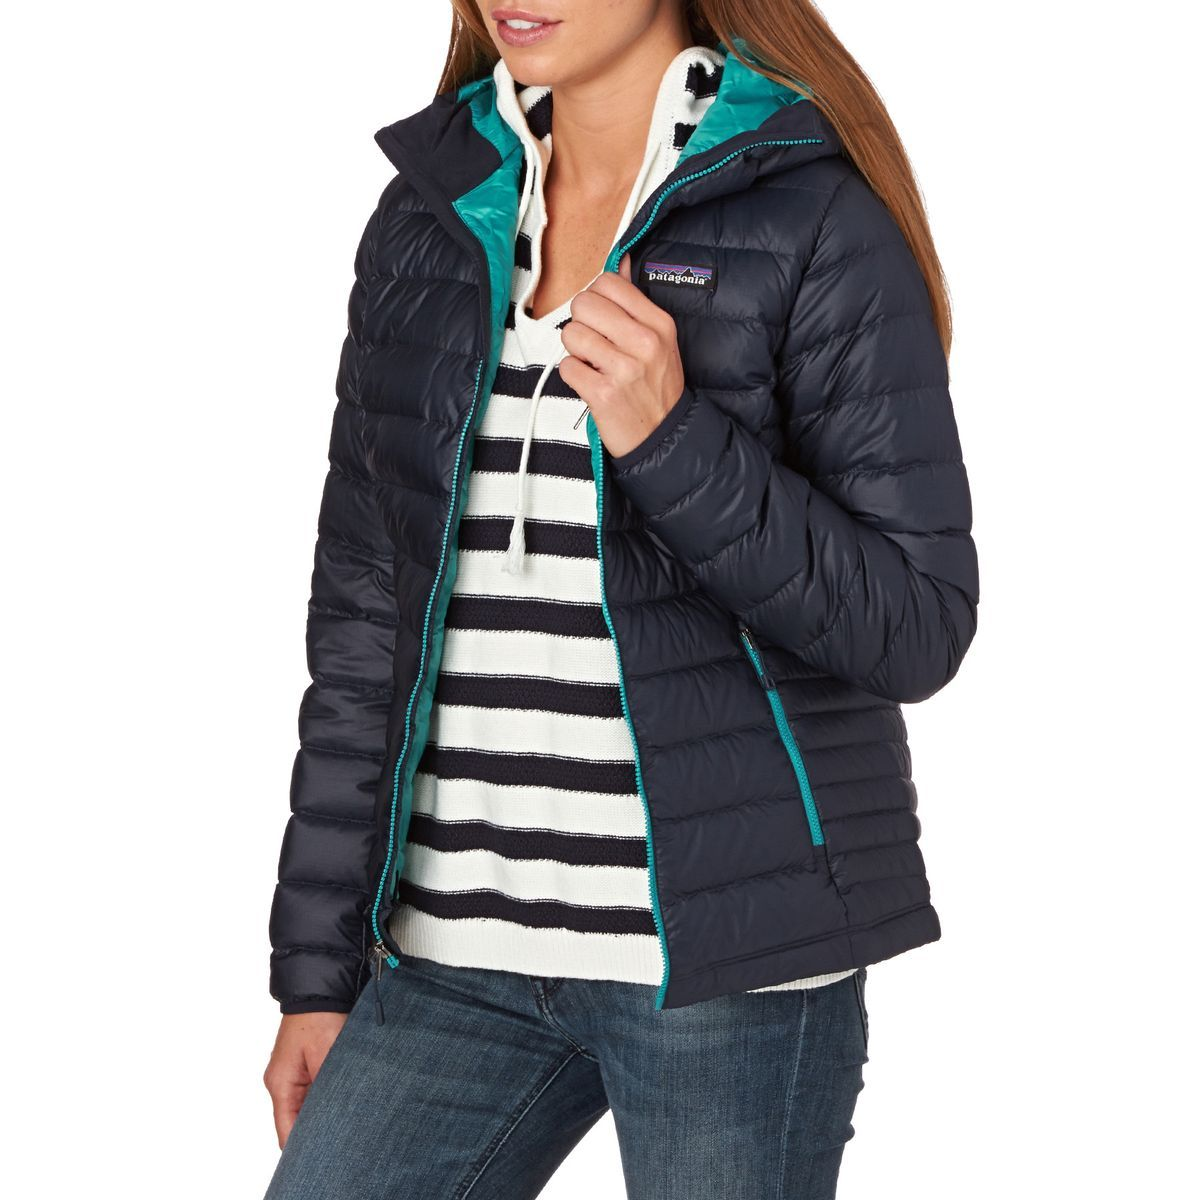 Nike epic jacket - Patagonia Women S Down Sweater Hooded Jacket Navy Blue Epic Blue